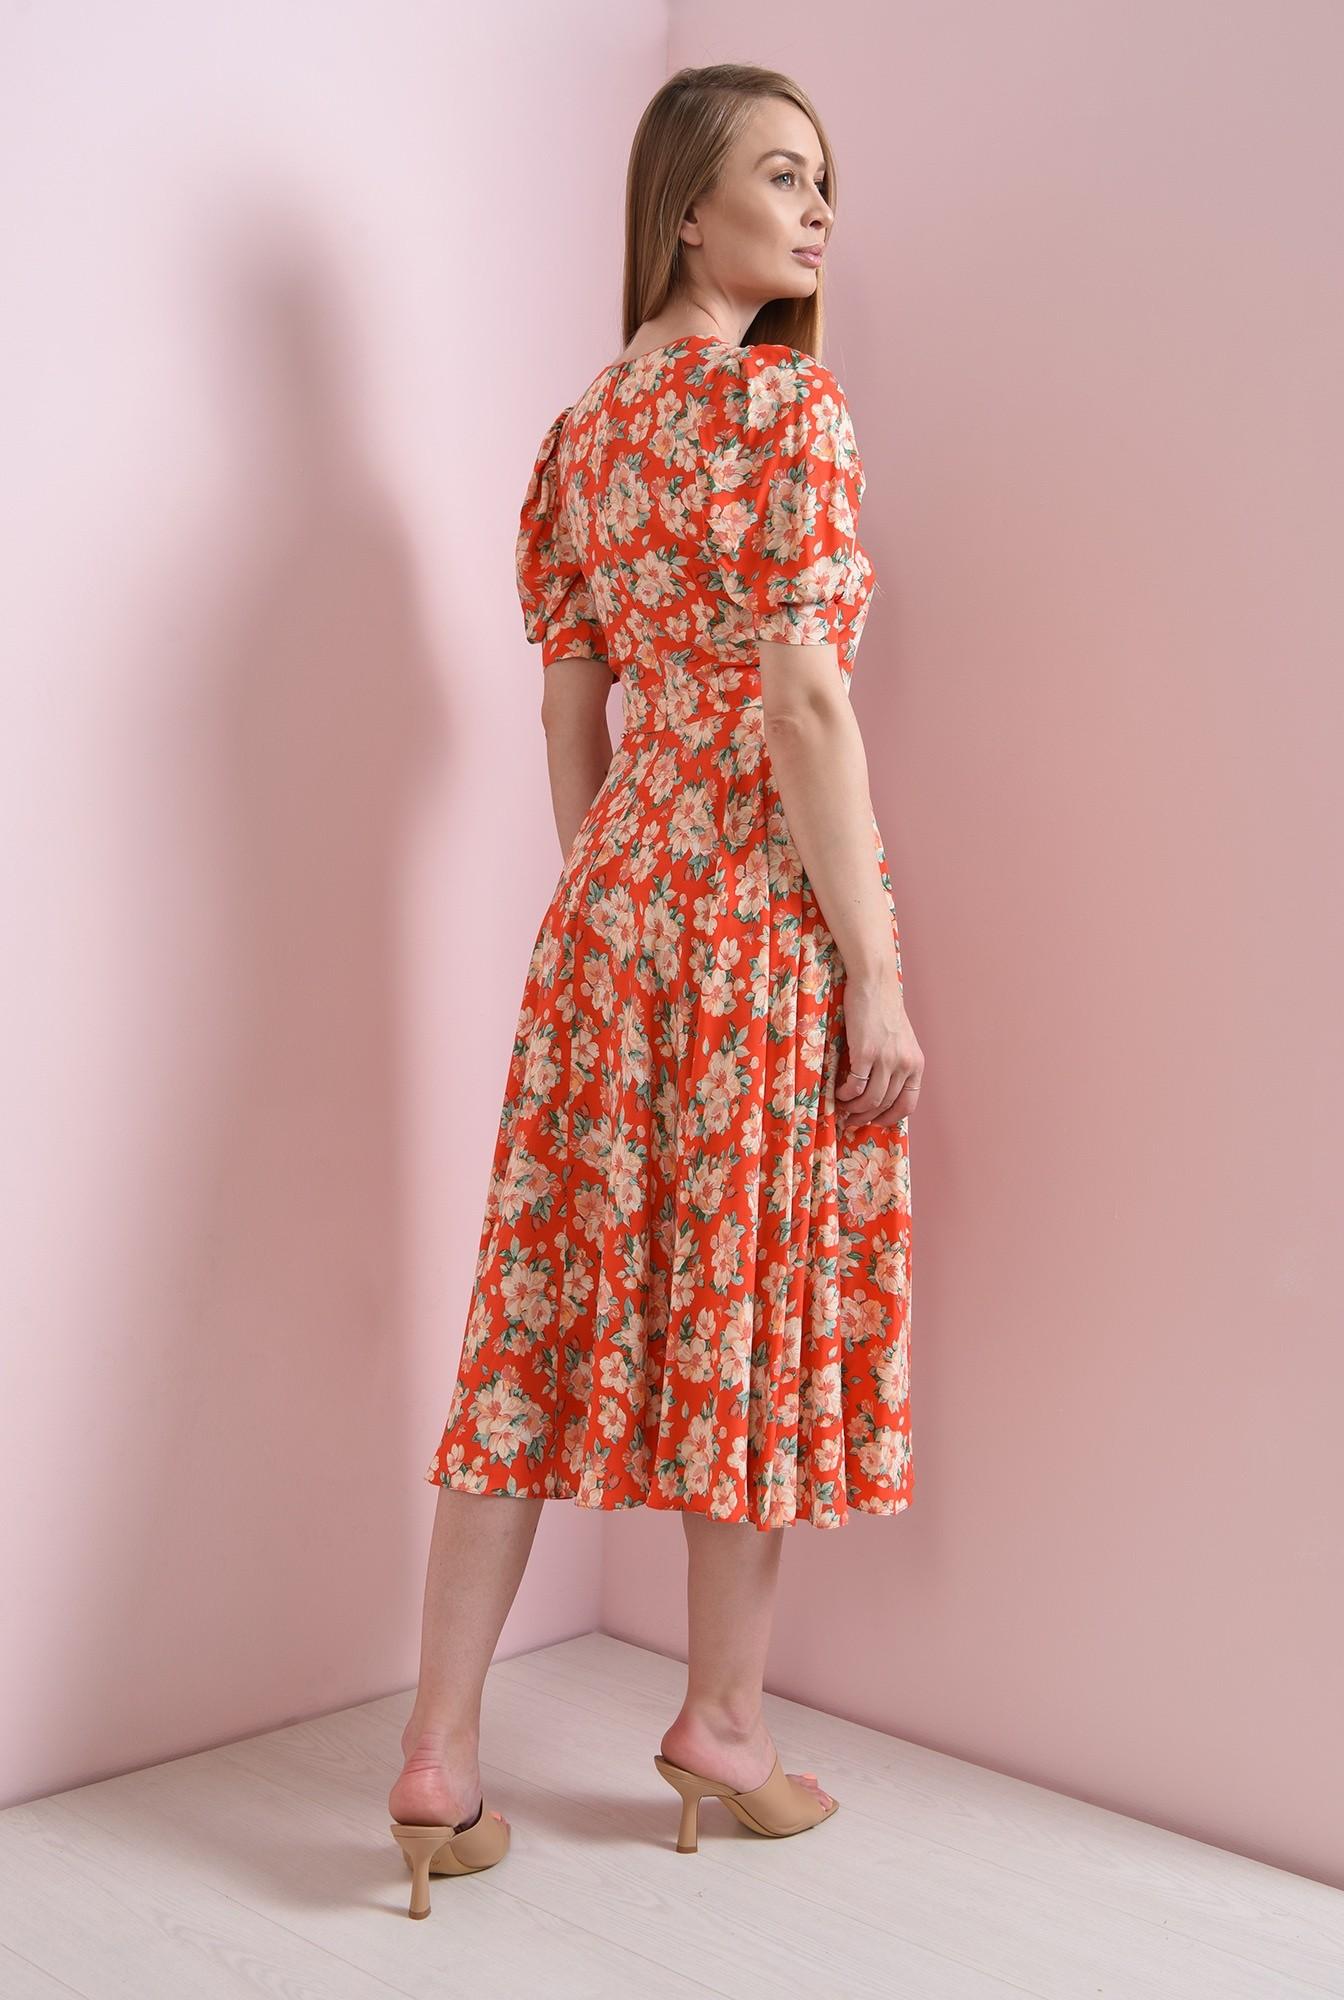 1 - rochie rosie, cu flori, evazata, Poema